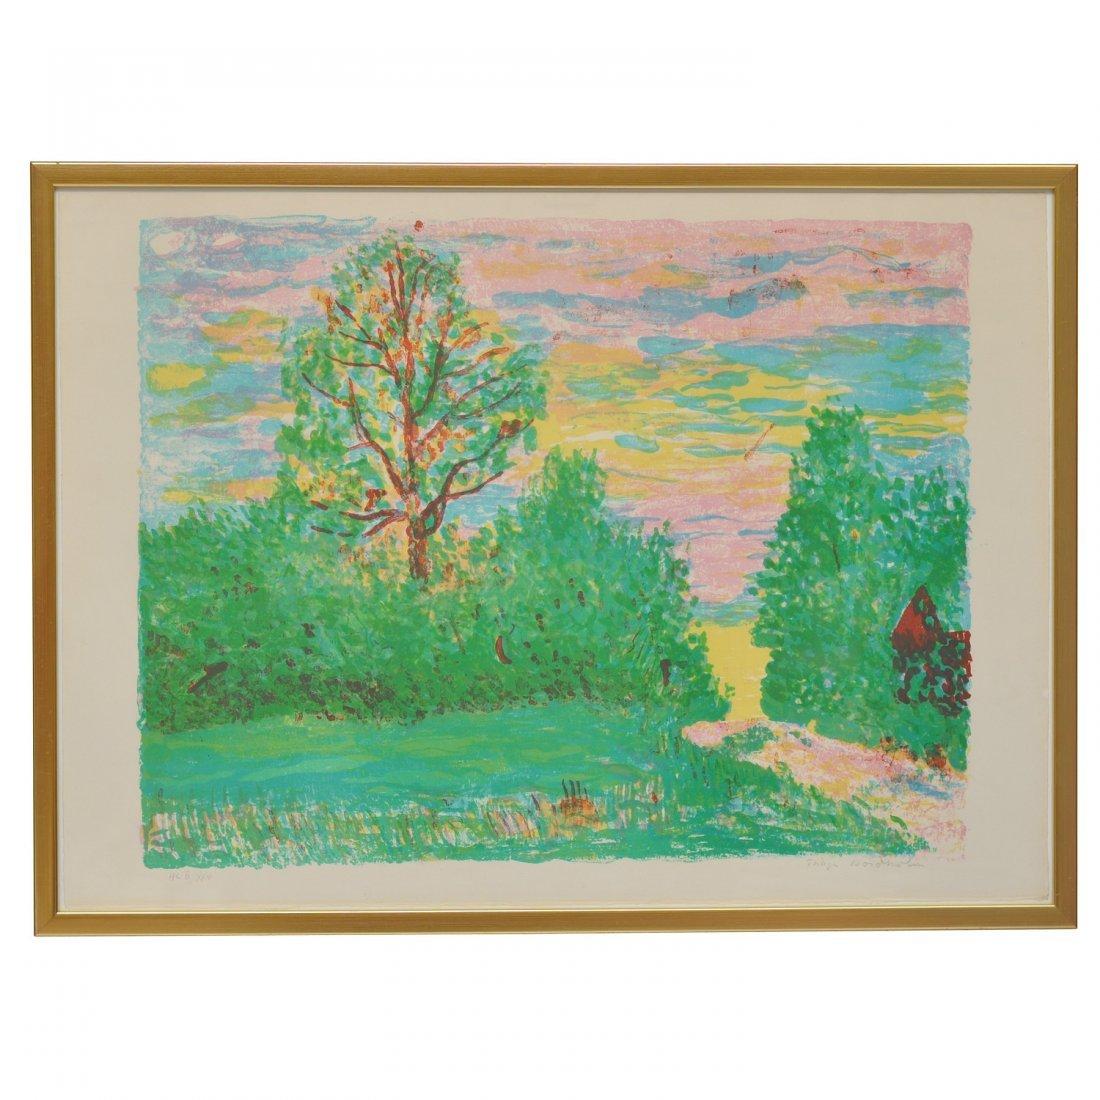 173: THAGE NORDHOLM (1927-1990), färglitografi